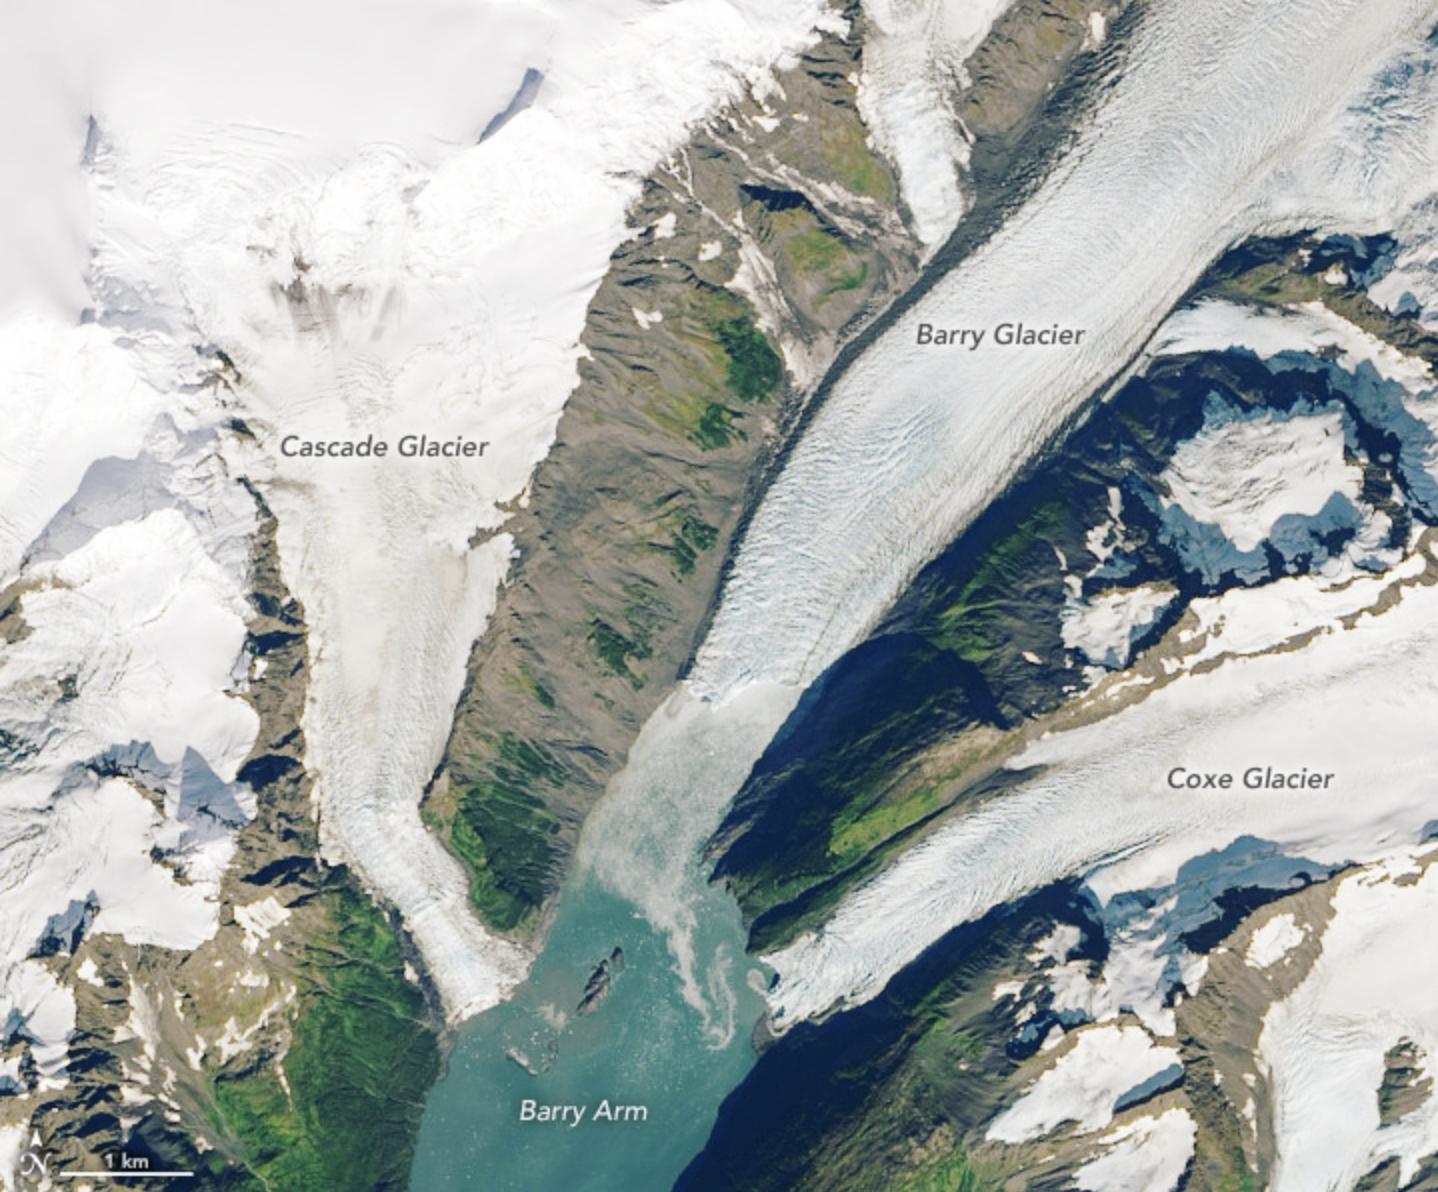 Image: Retreating Glacier Presents Landslide Threat, Tsunami Risk in Alaskan Fjord